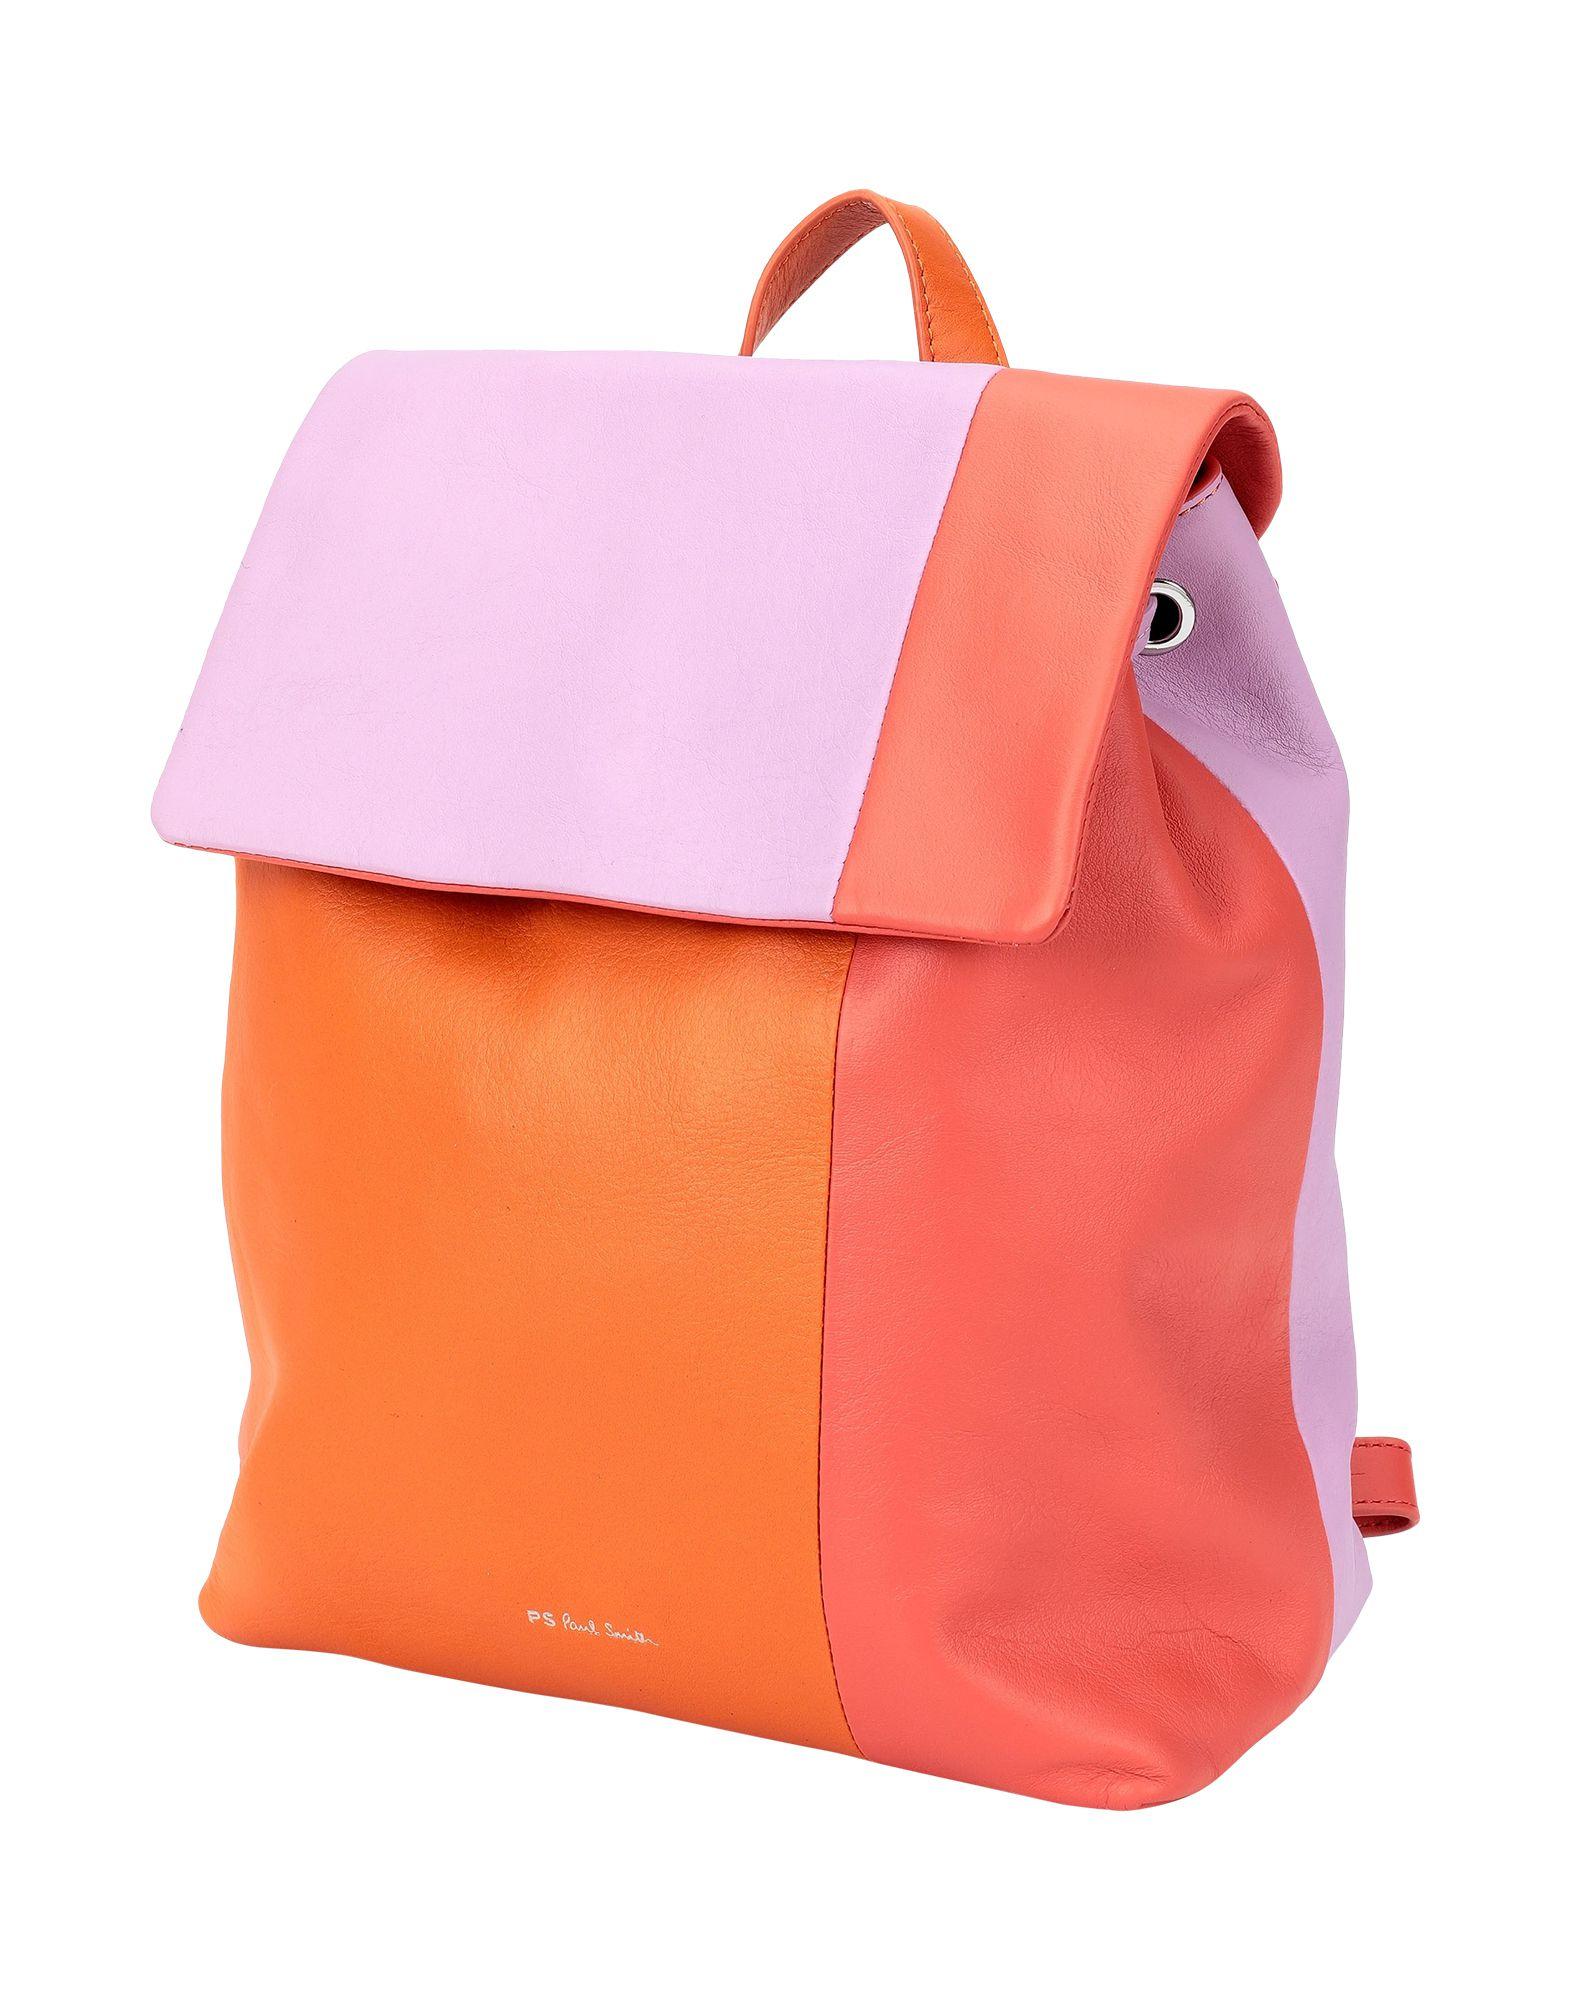 Фото - PS PAUL SMITH Рюкзаки и сумки на пояс paul smith деловые сумки